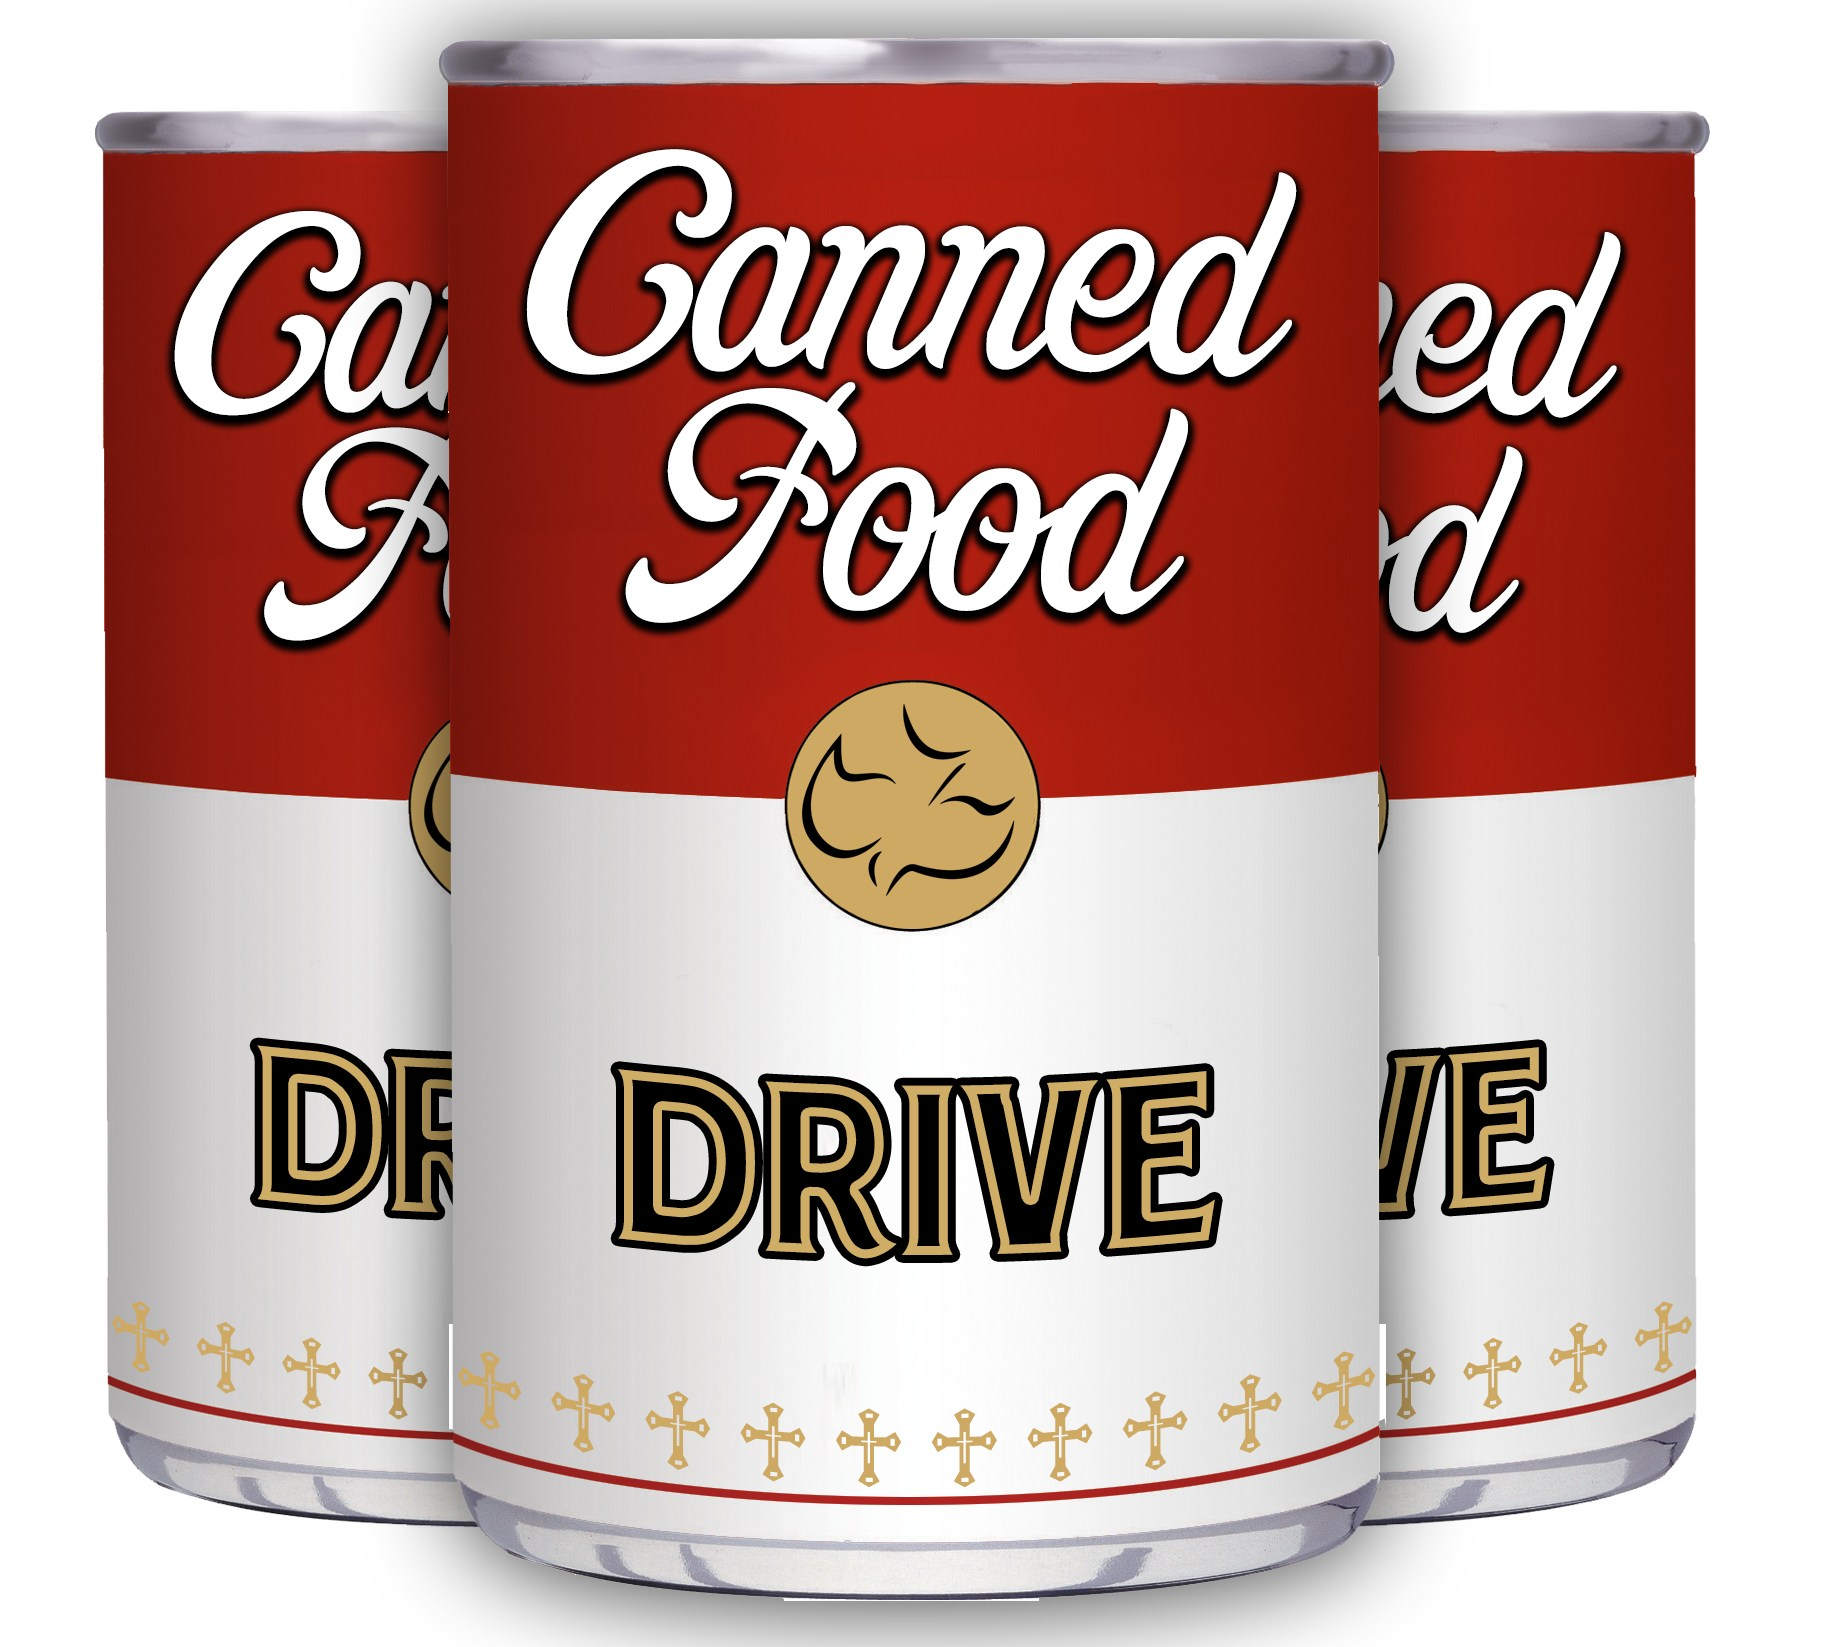 Can food drive clipart 4 » Clipart Portal.